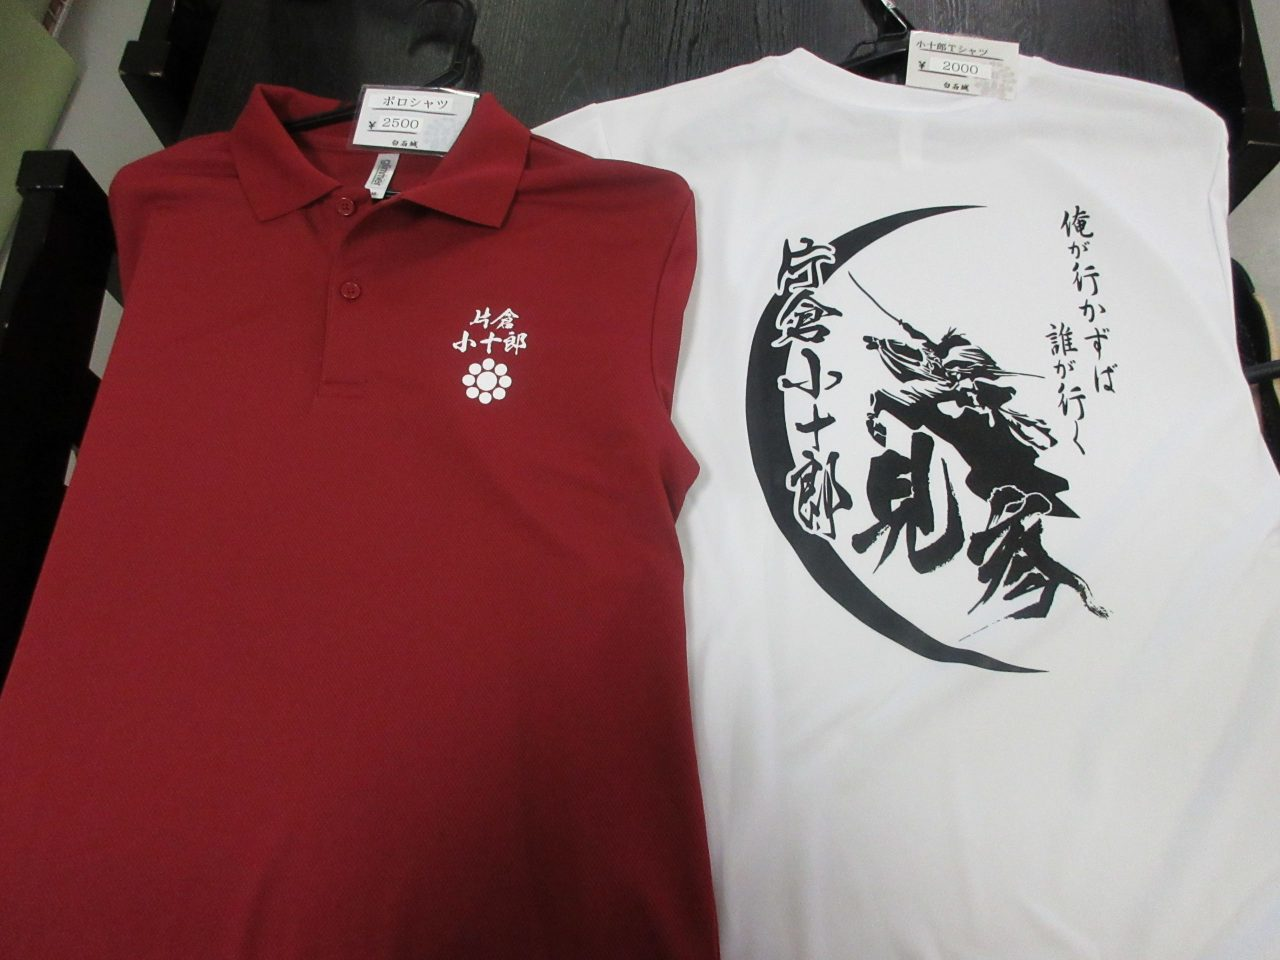 Check out Shiroishi's souvenir!